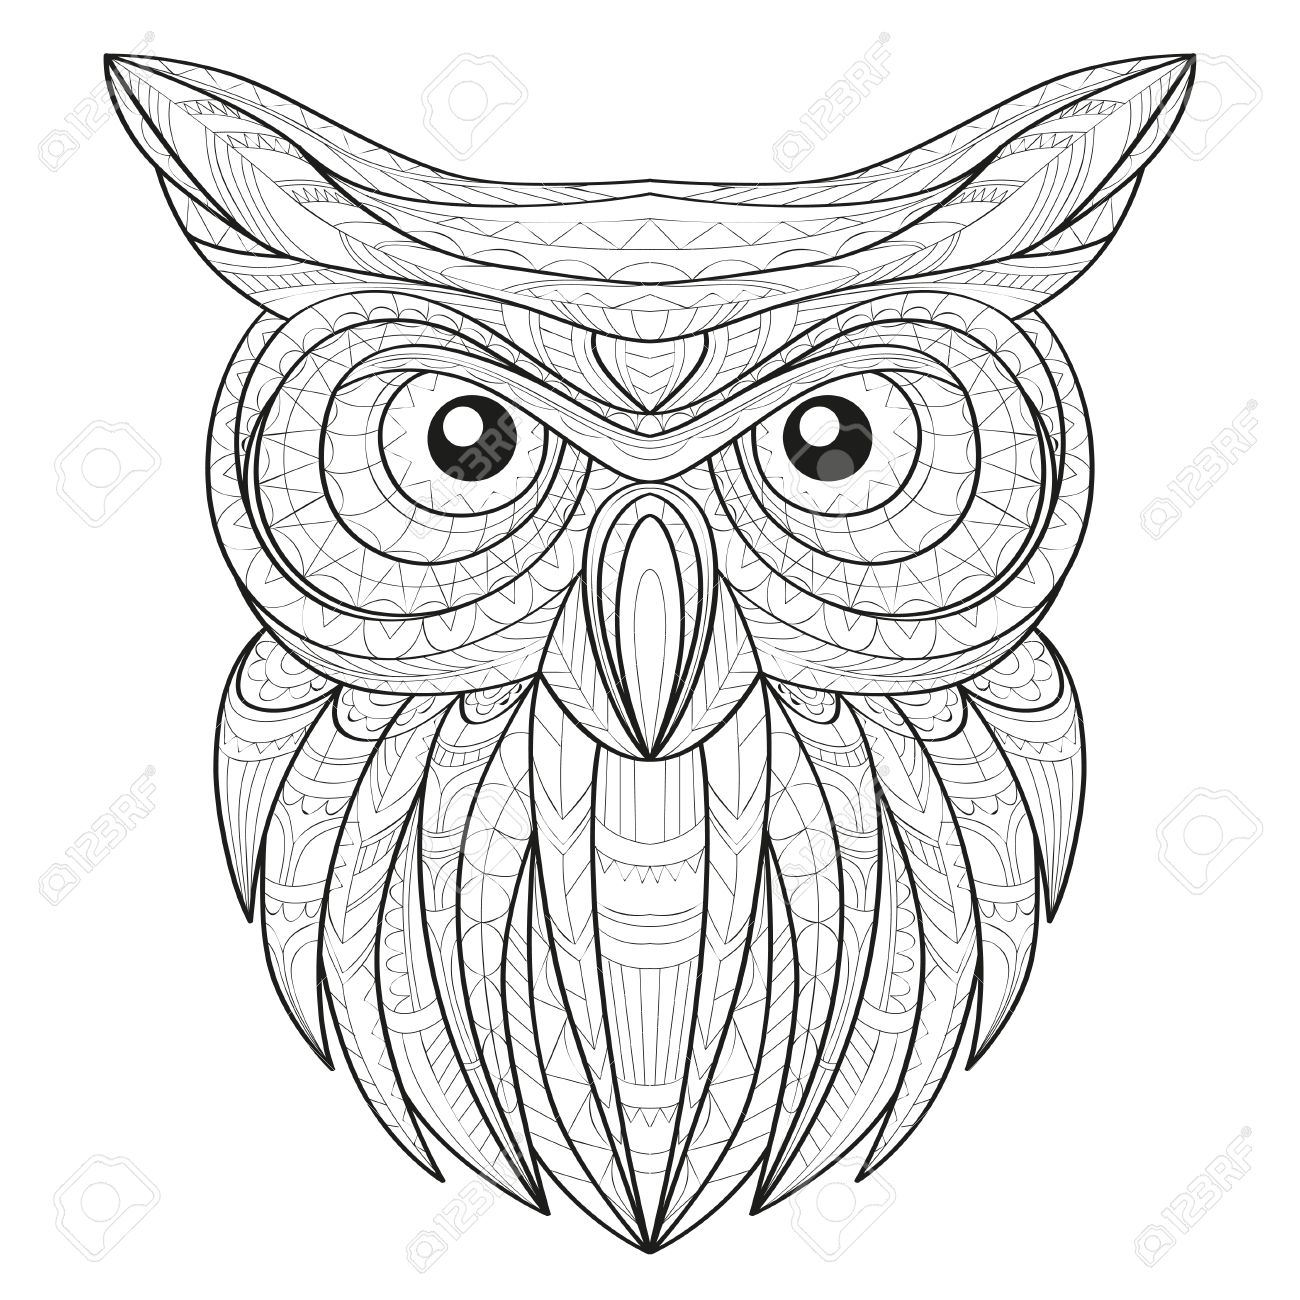 240e799b8c73e Hand drawn doodle outline owl illustration. Decorative in African indian  totem Ethnic tribal aztec design